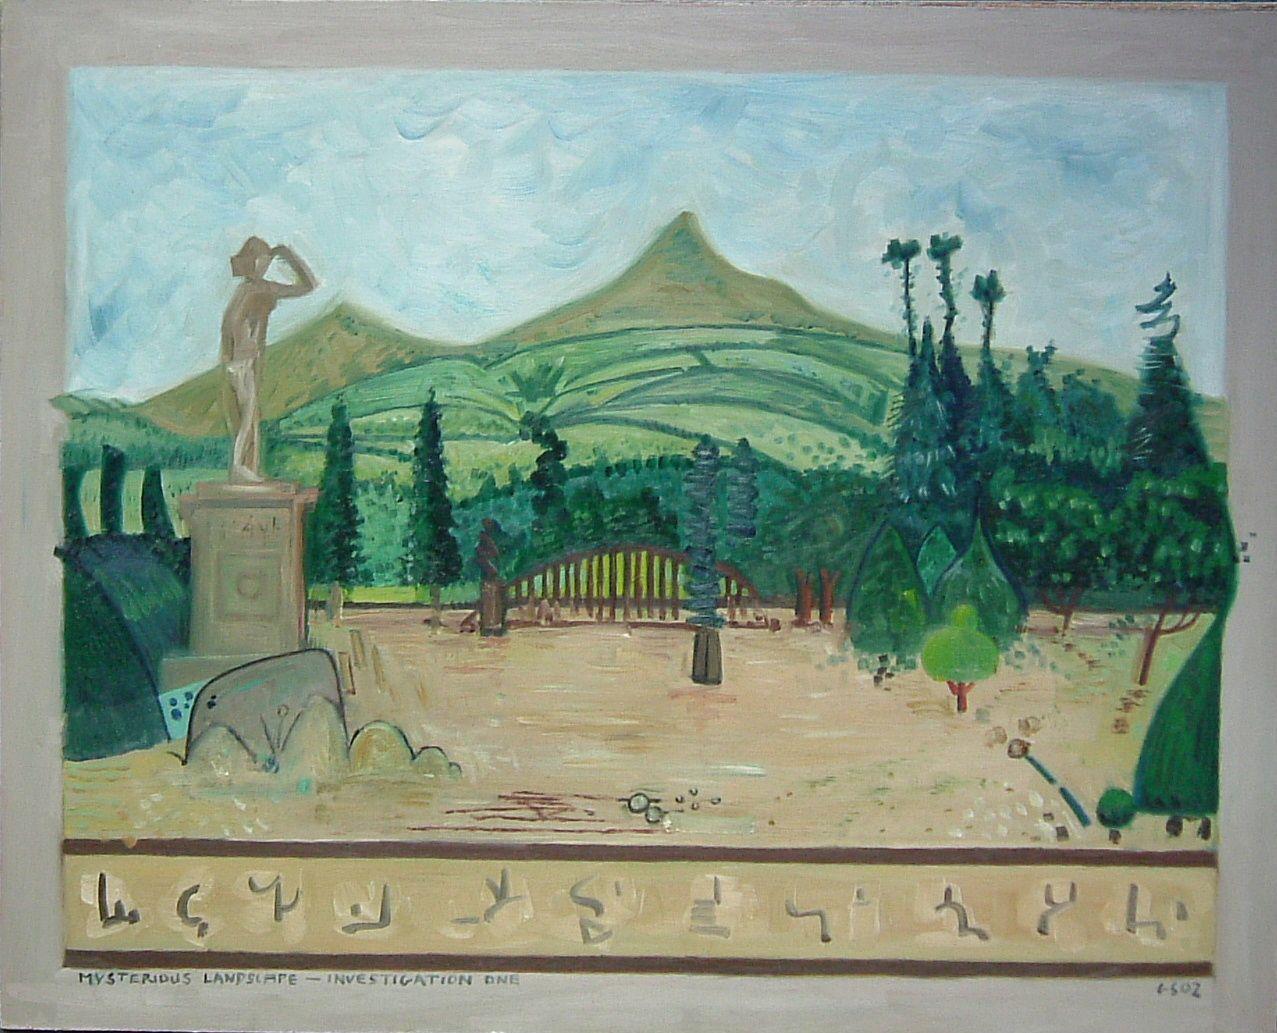 Gerald Shepherd: Mysterious Landscape - Investigation 1